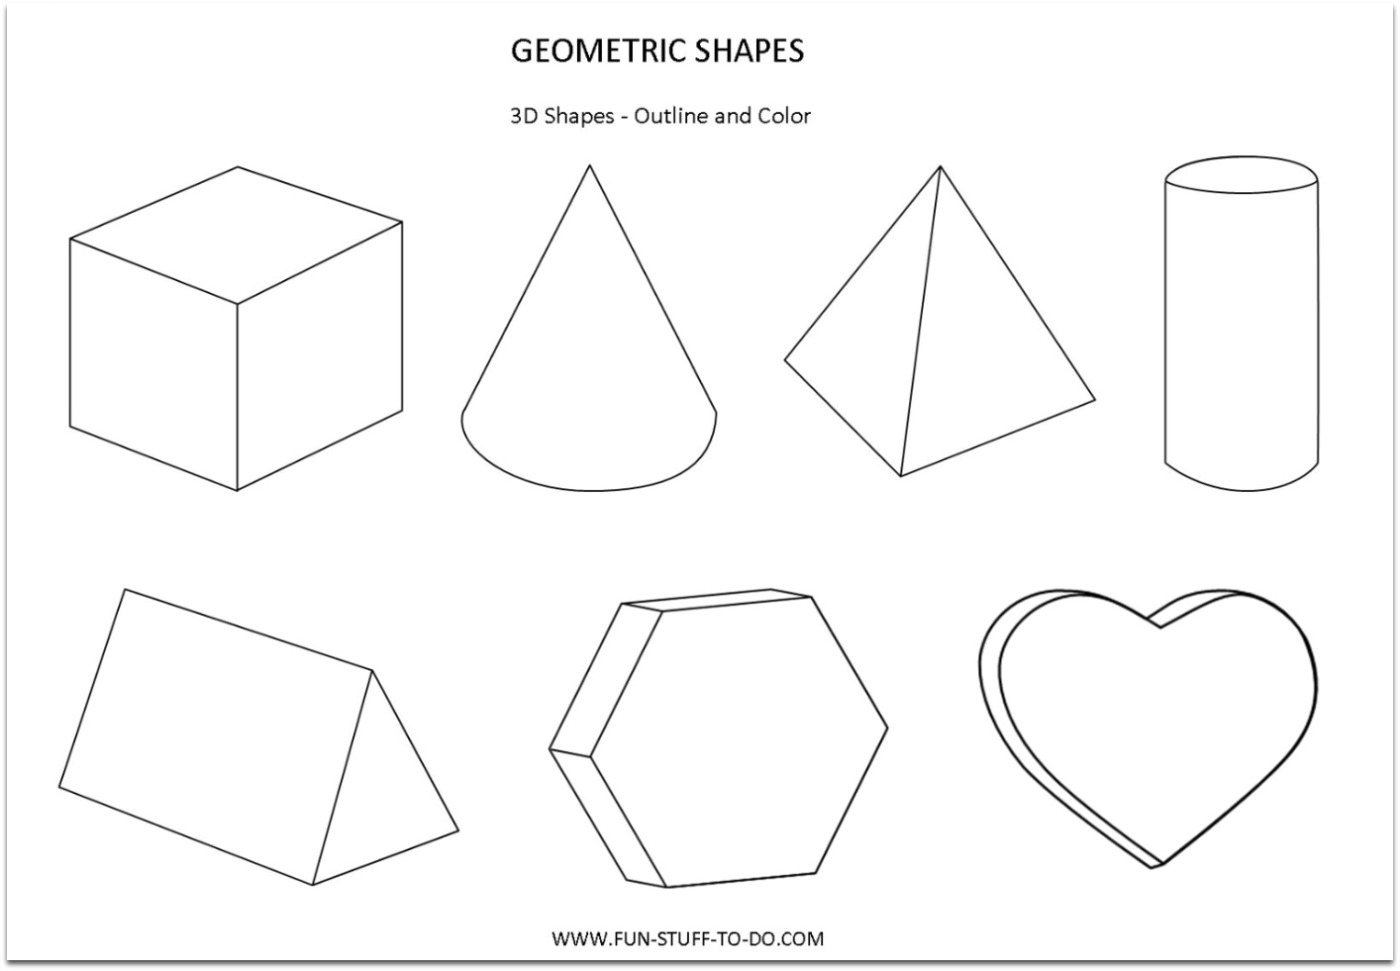 6 Best Images of Printable 3D Shape Templates For Teachers